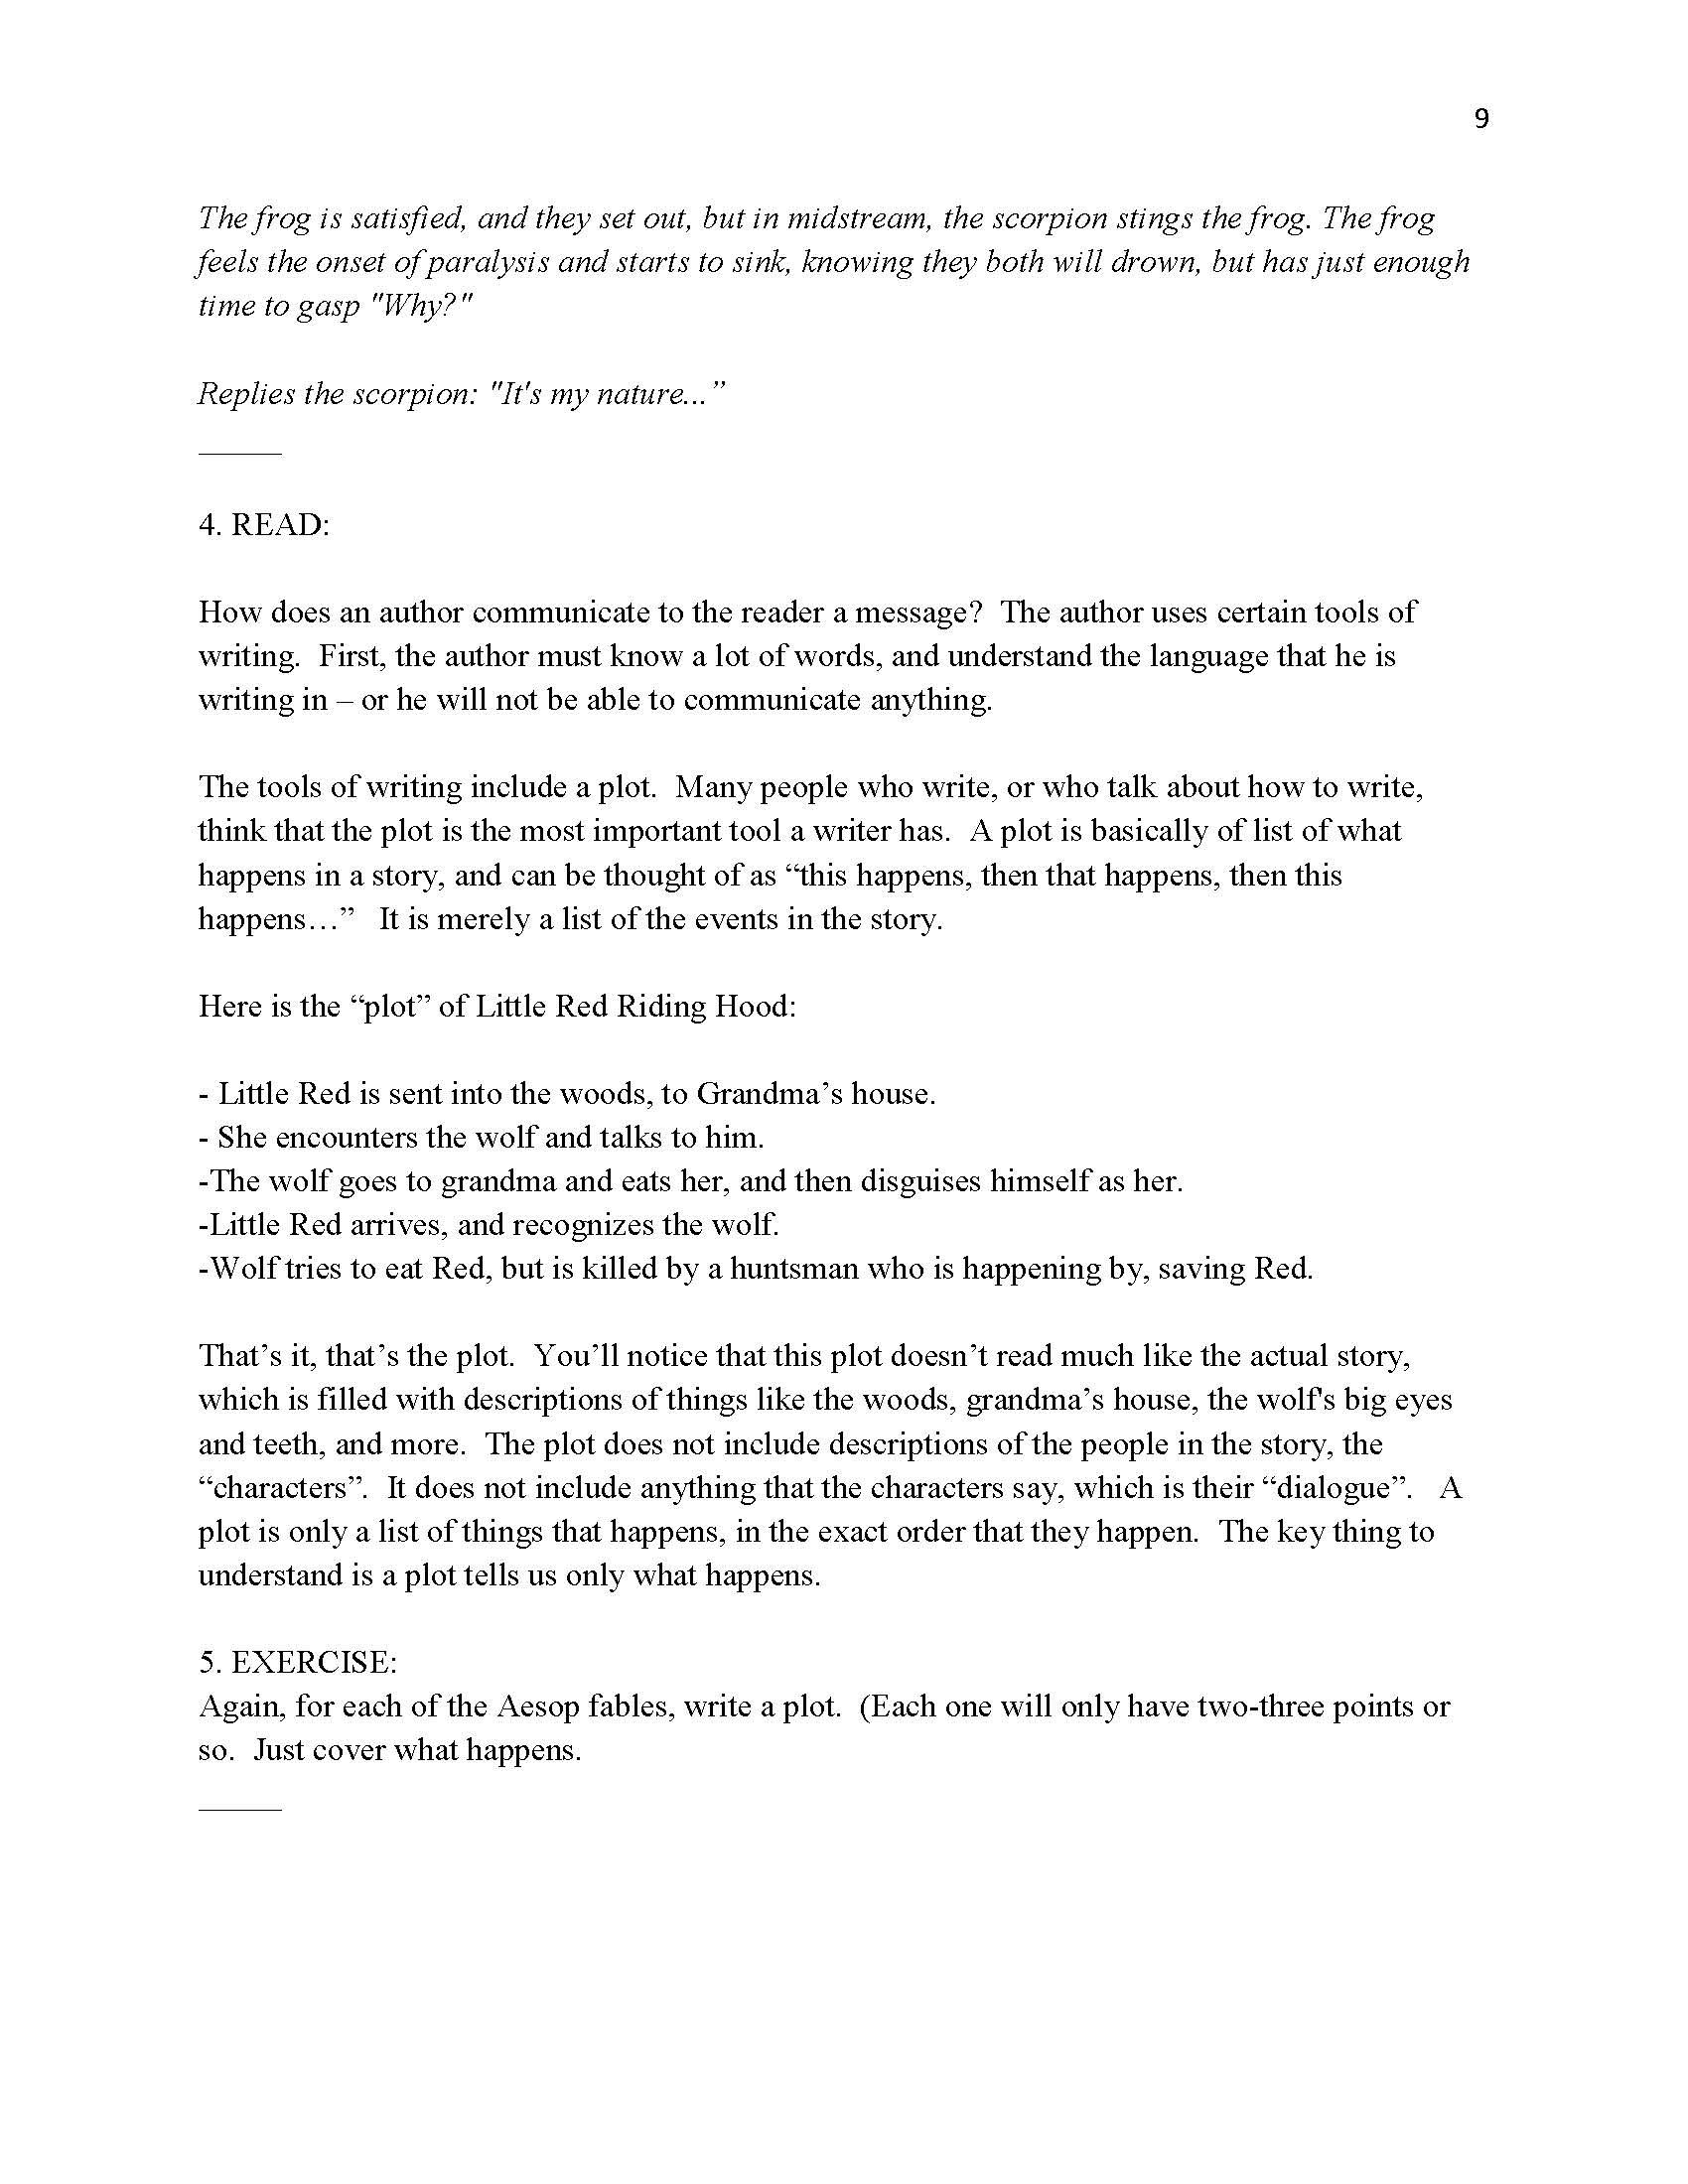 Step 3-4 Literature Guide - Sherlock Holmes Stories_Page_010.jpg